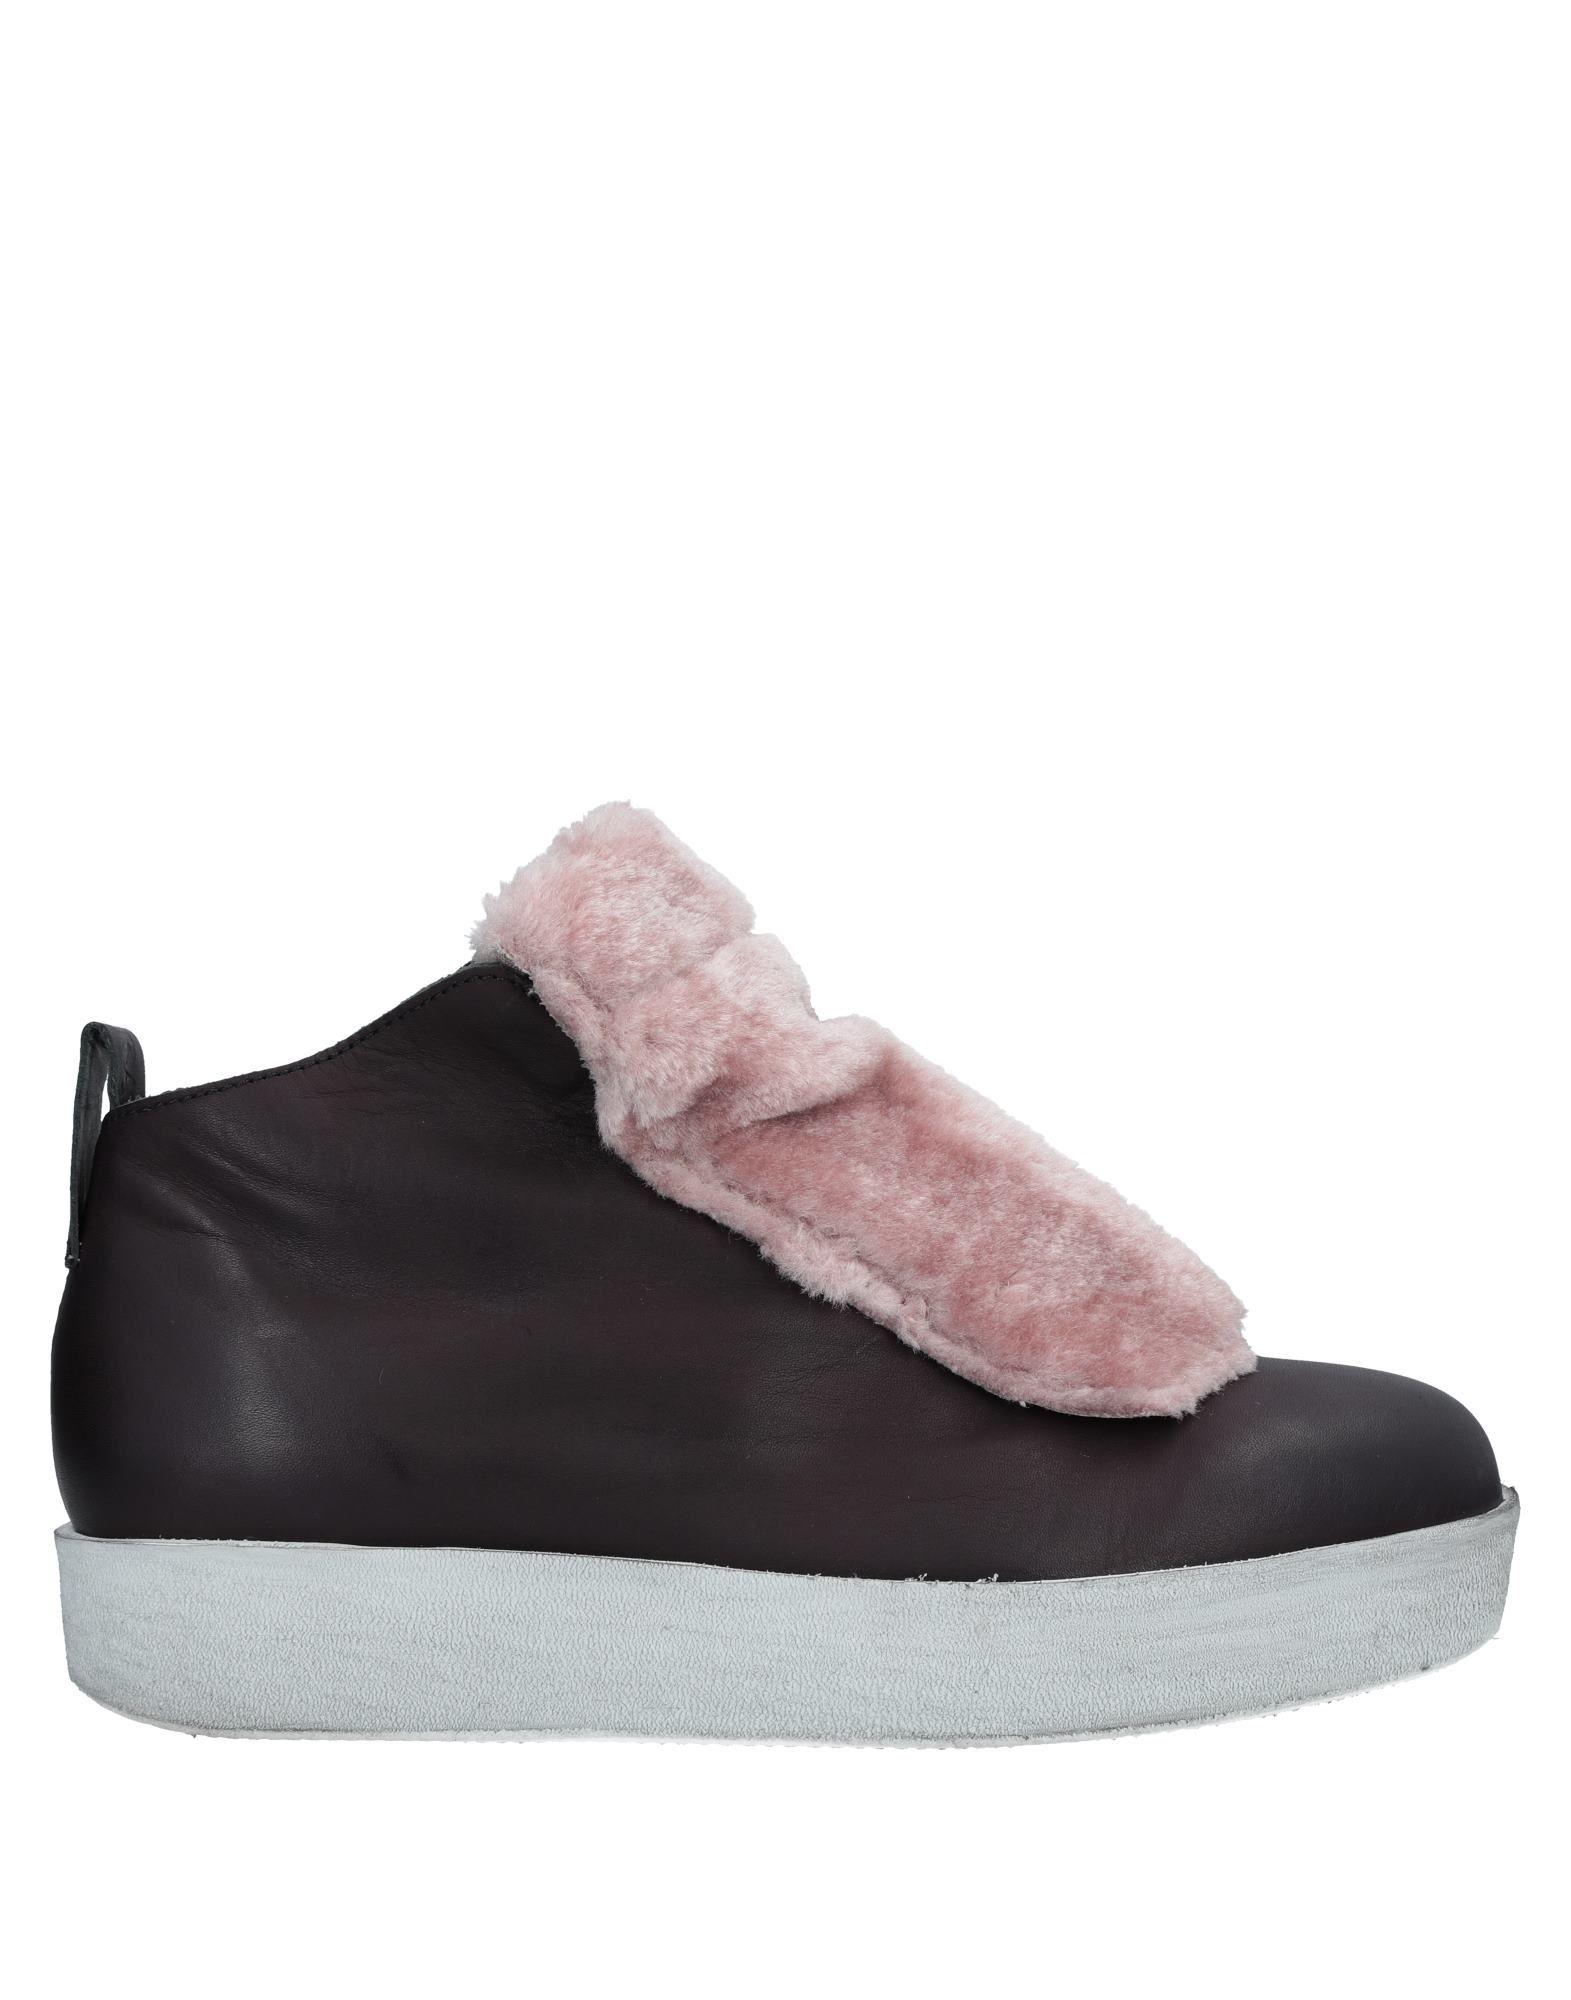 Andìa Fora Sneakers Damen  11530866QF Gute Qualität beliebte Schuhe